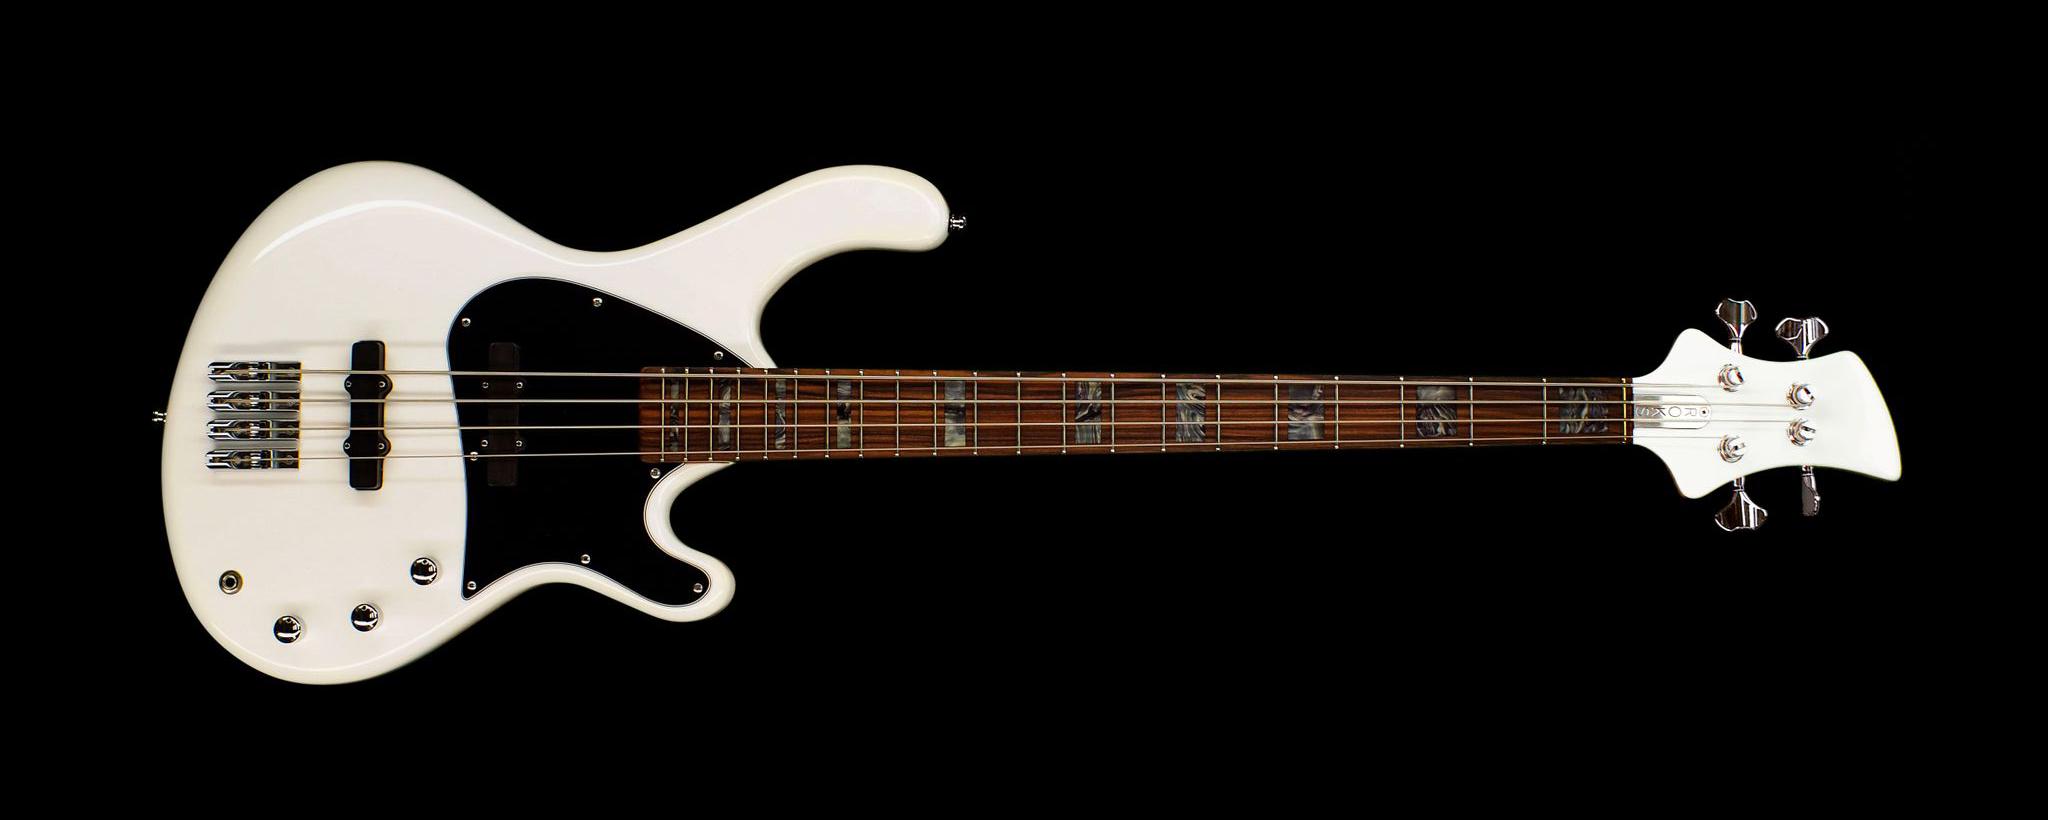 Nardis bass Hawthorn White